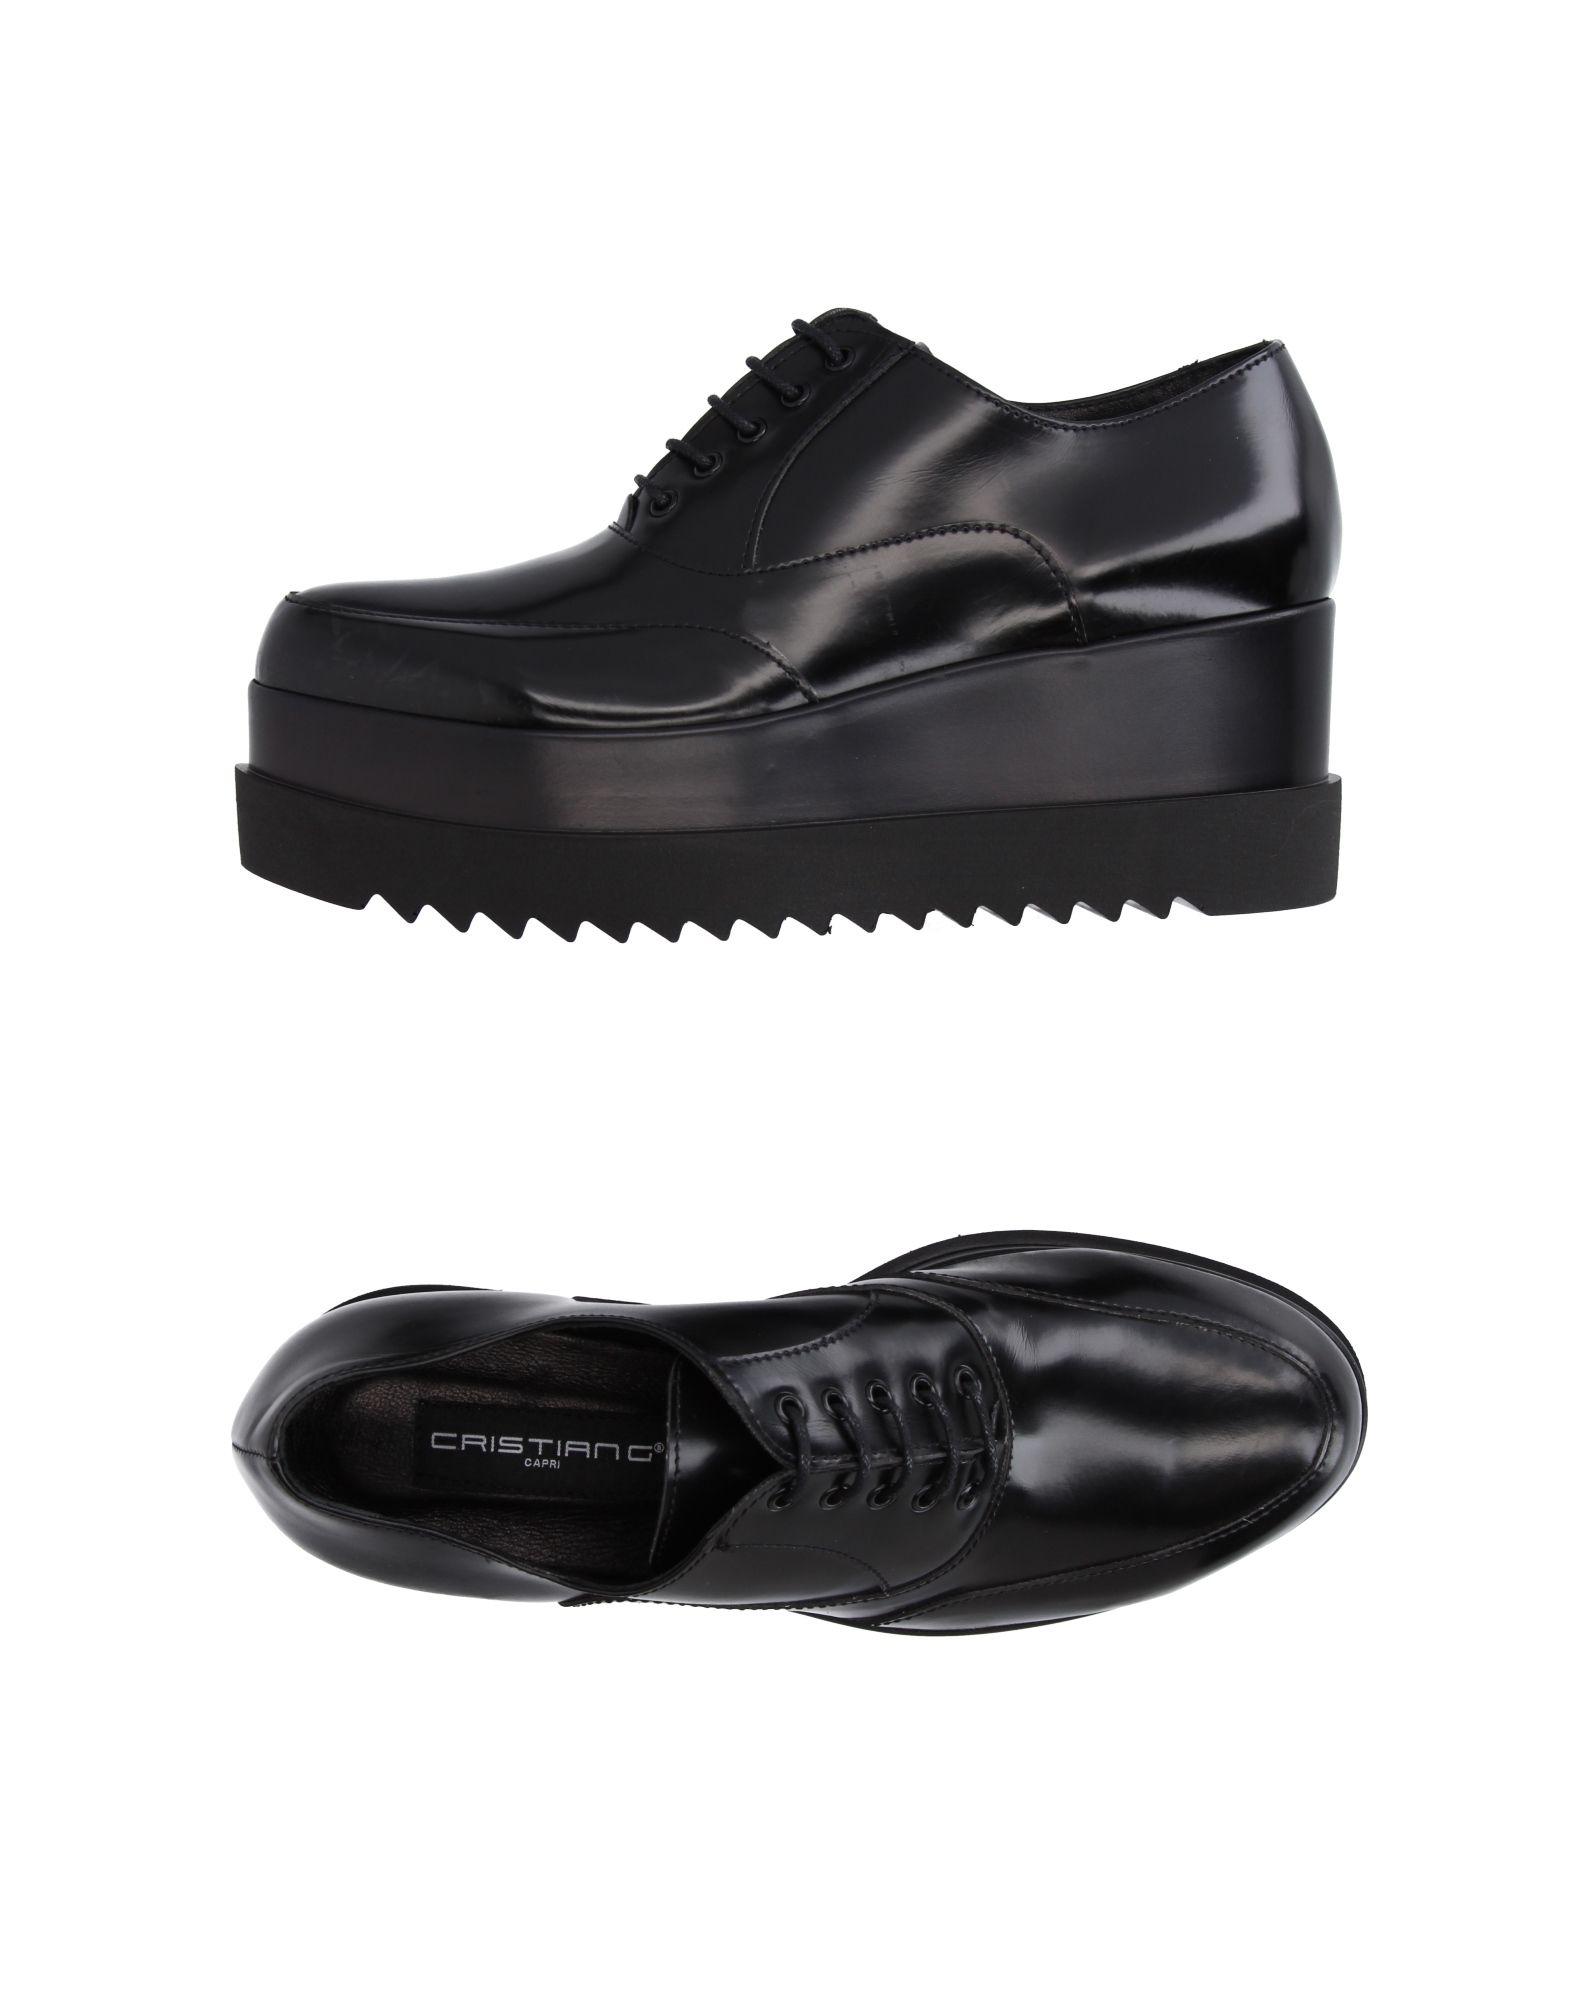 CRISTIAN G Обувь на шнурках maritan g обувь на шнурках